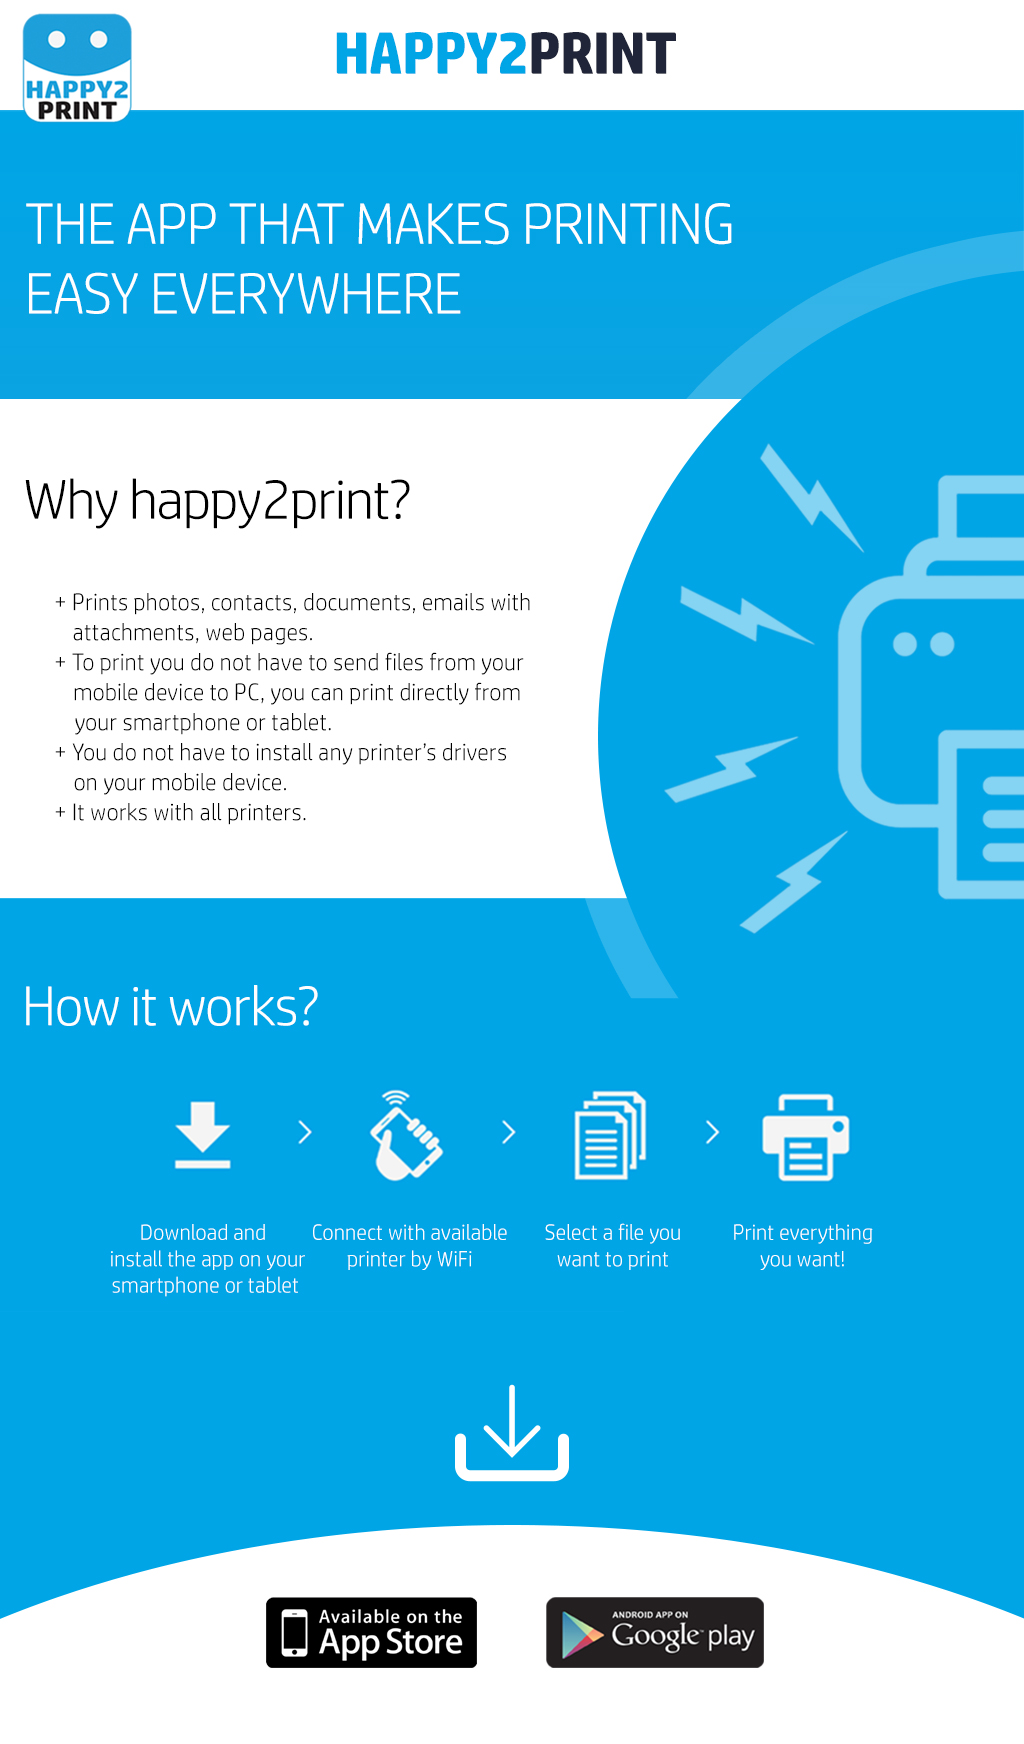 H2P_infographic_VF